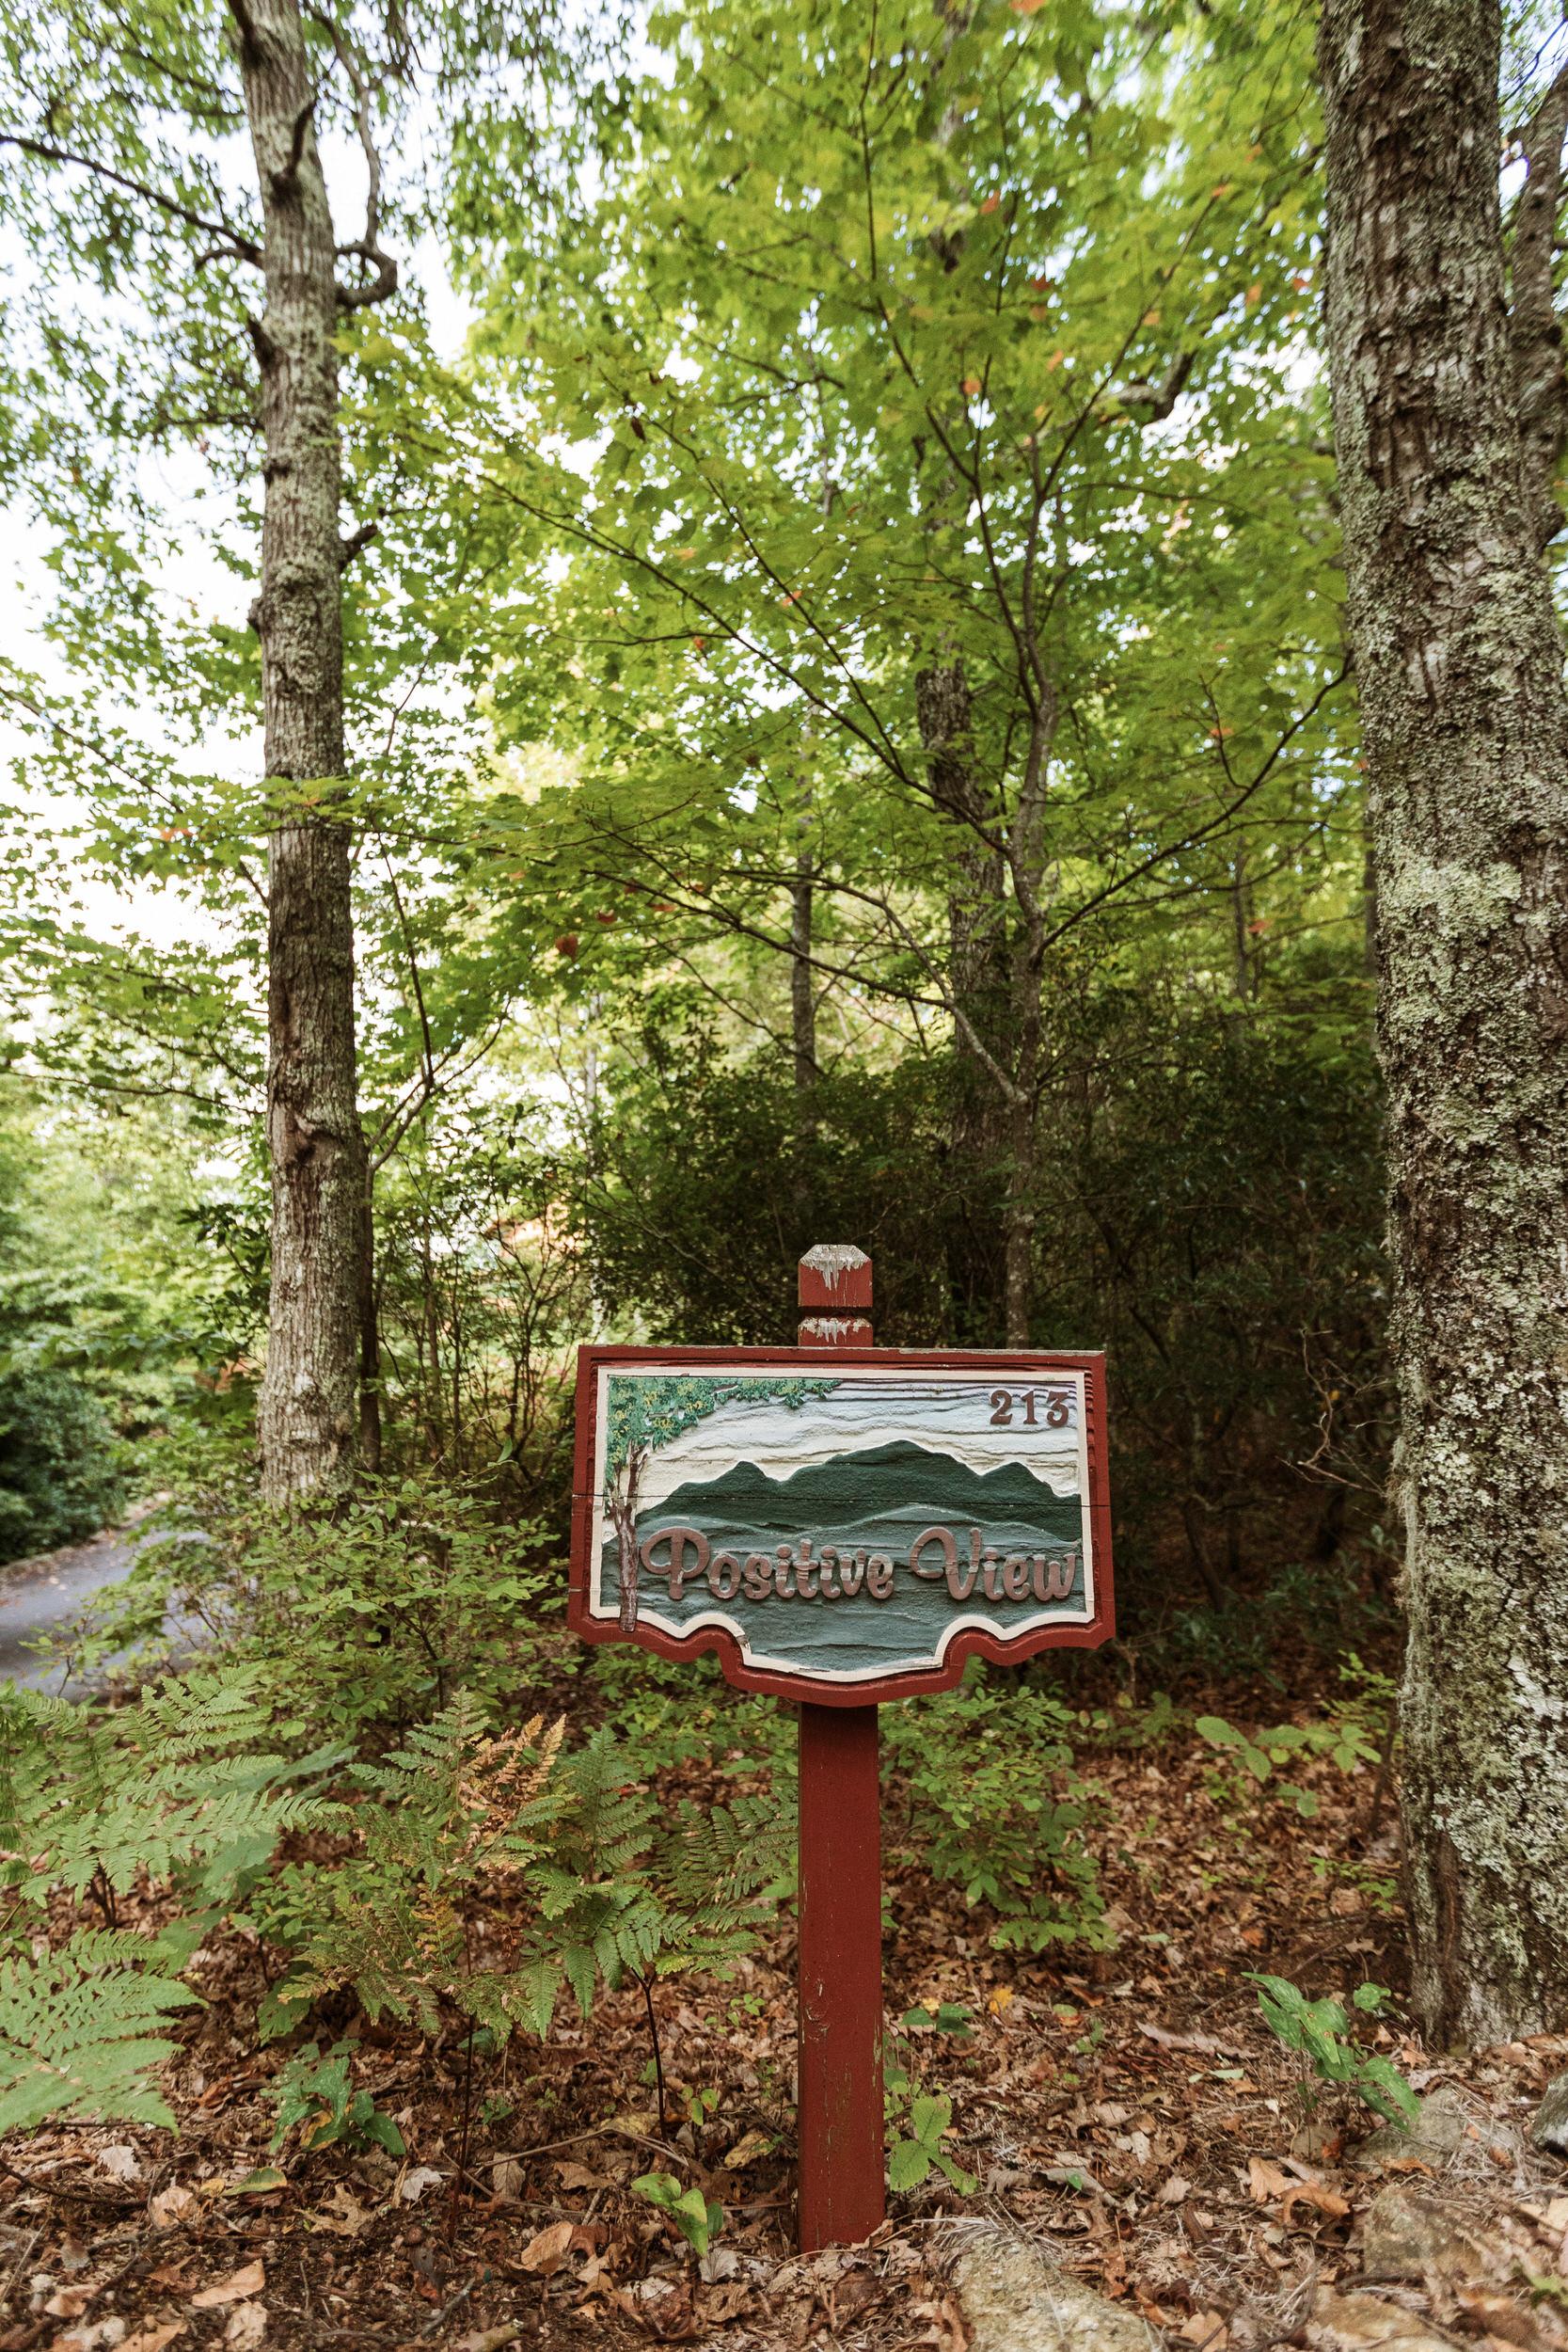 2. Groom's Morning - Cole + Rachel's Great Smoky Mountain National Park Elopement-4.jpg